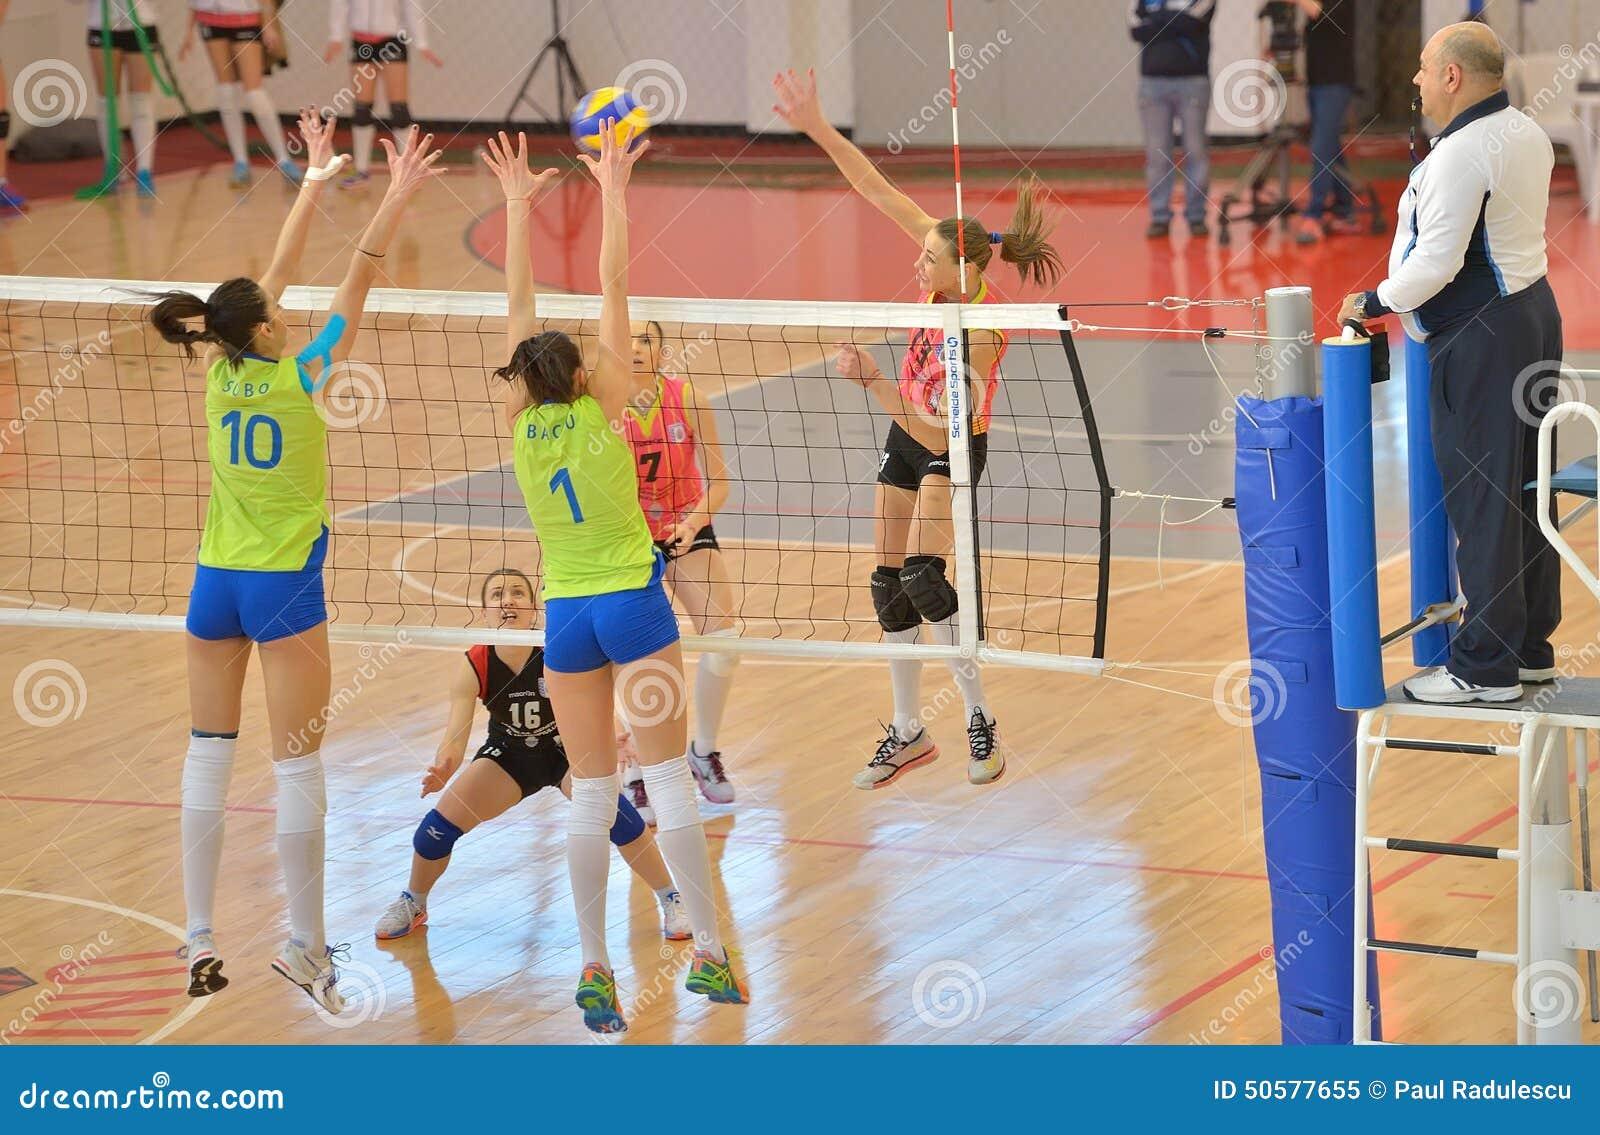 Kremena Kamenova, attacks during the match between CSM Bucharest and CS Stiinta Bacau